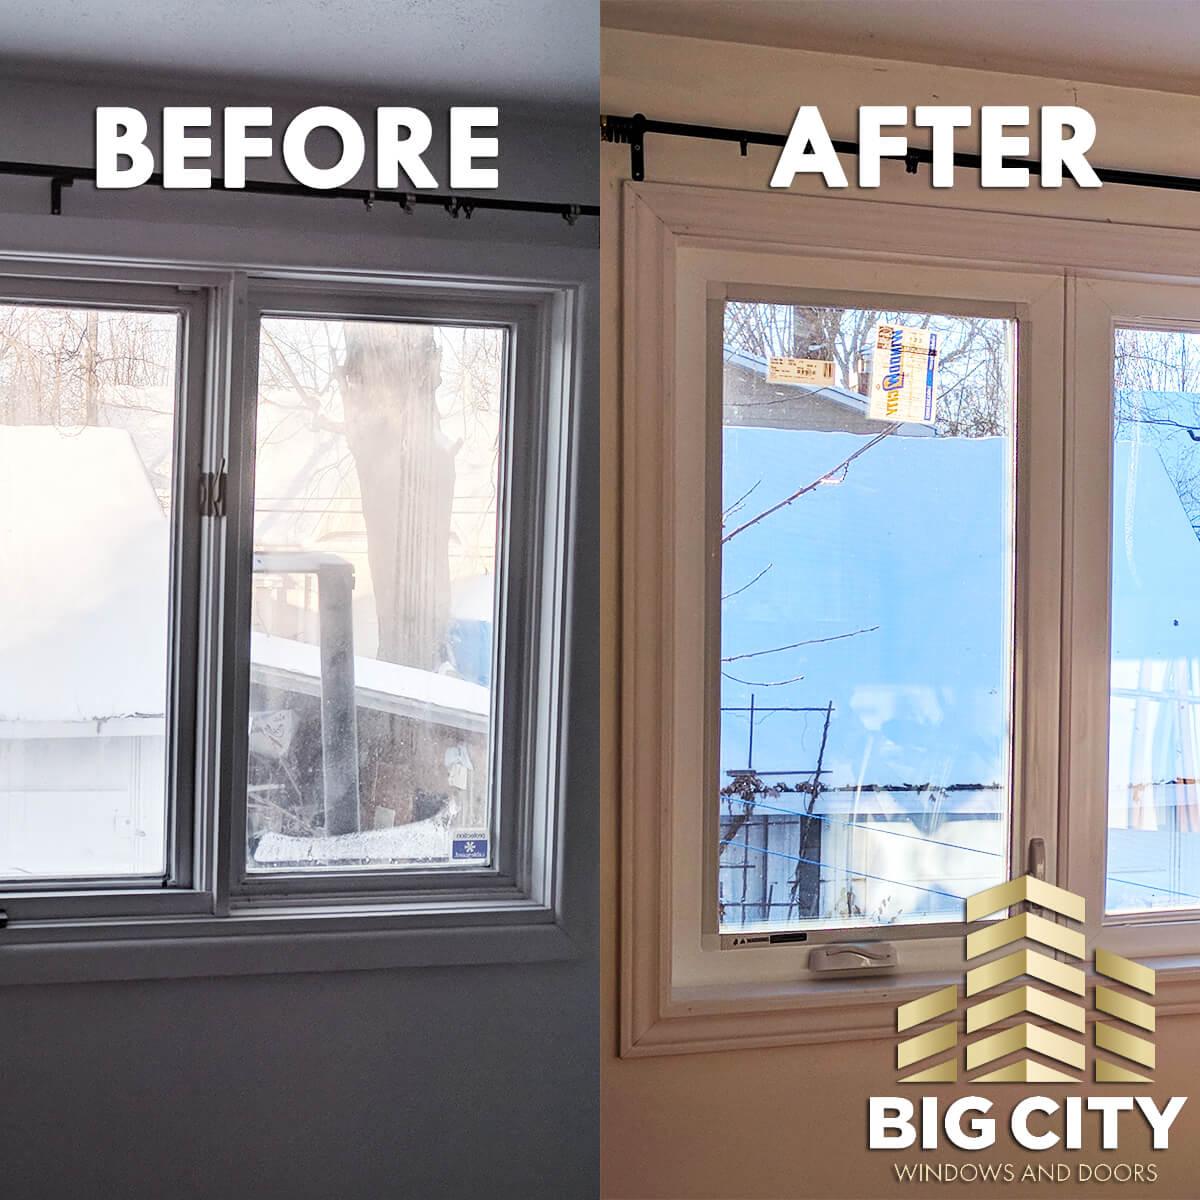 Big City Windows And Doors On Twitter Old Windows Provide Poor